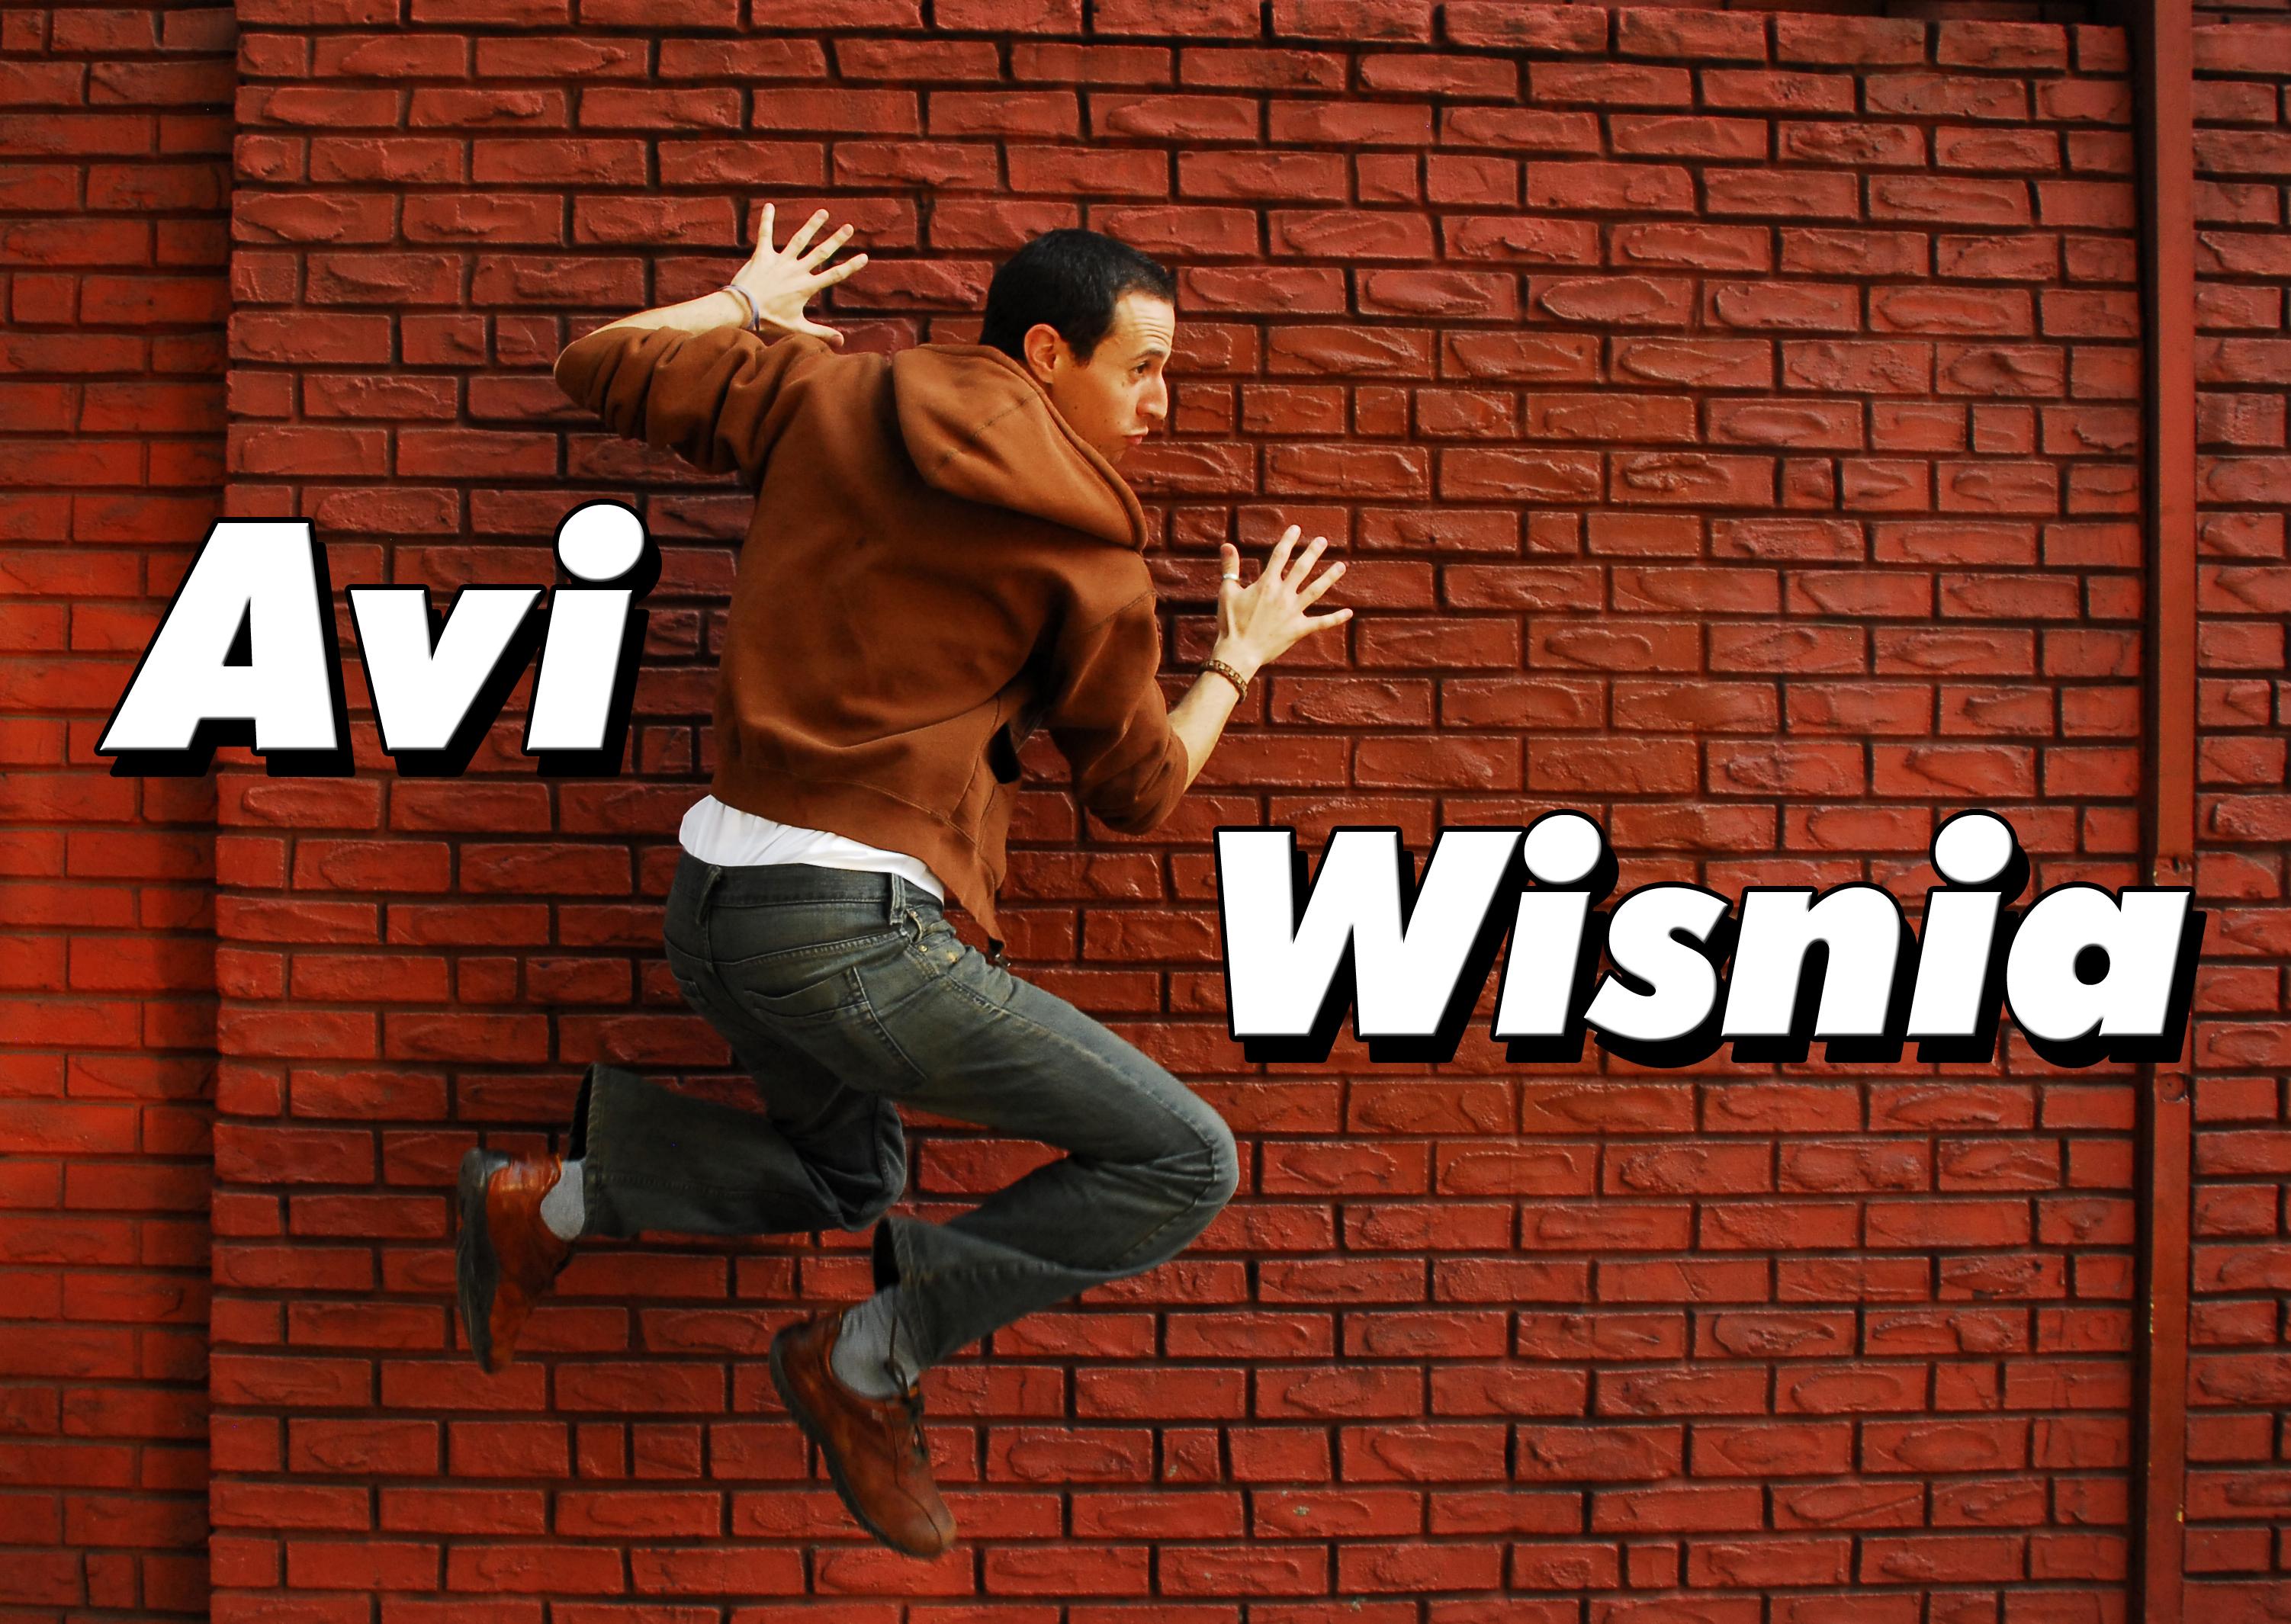 Avi Wisnia Red Wall Name Title New York NYC Rachel Dobkins Photography Promo Photo Portrait